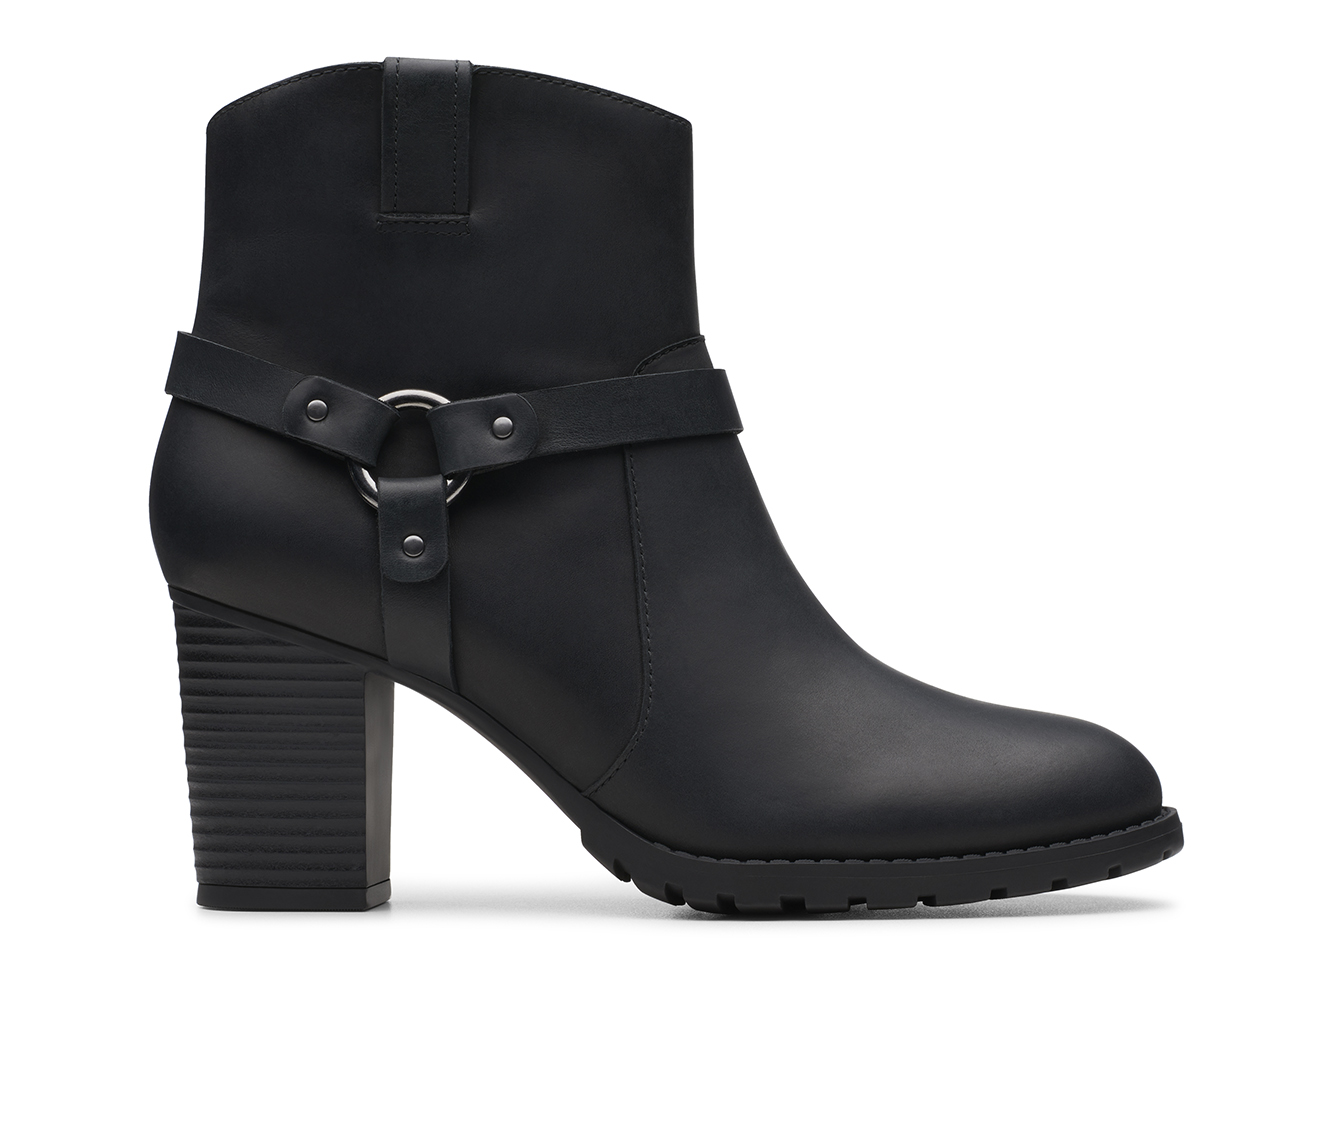 Clarks Verona Rock Women's Boot (Black Leather)